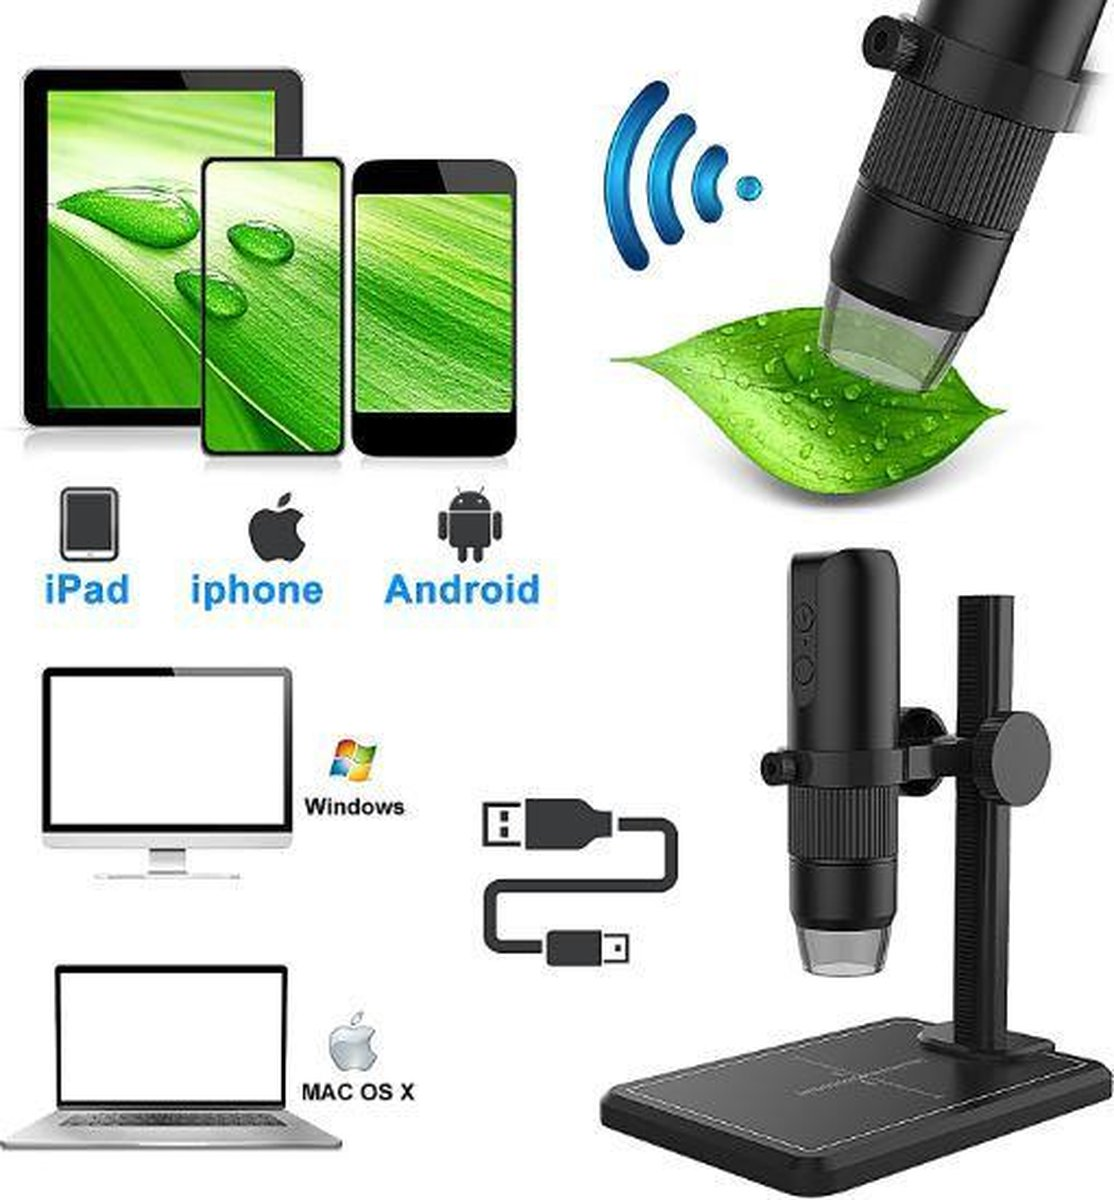 Wifi Microscoop draadloos 50x1000 foto en video voor android 5 IOS en Mac os 10.5 of hoger